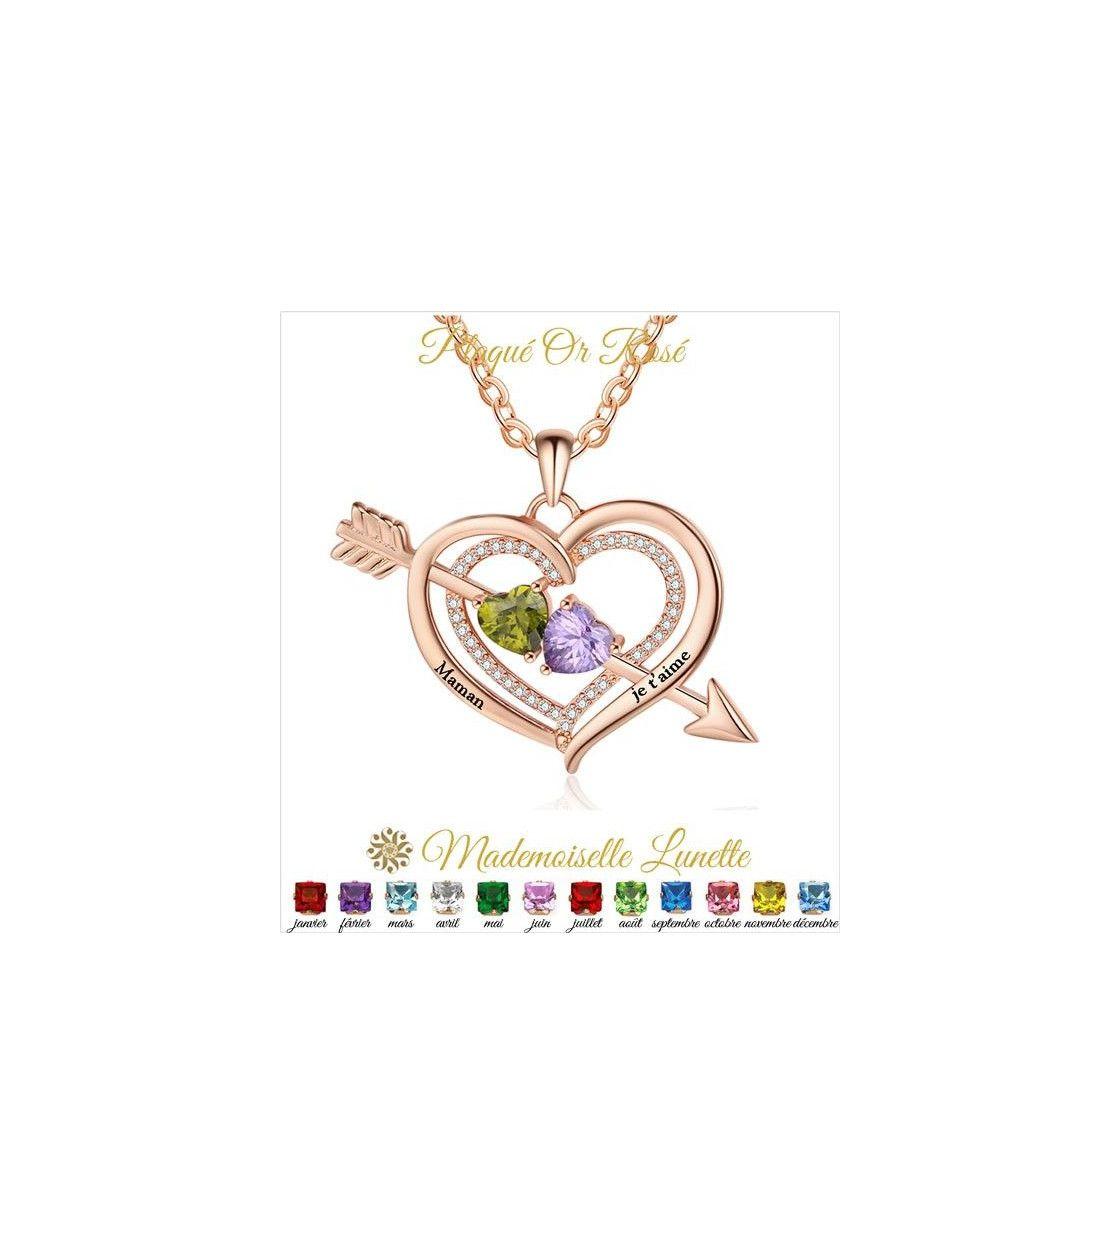 pendentif-collier-coeur-en-or-rose-avec-personnalisation-prenoms